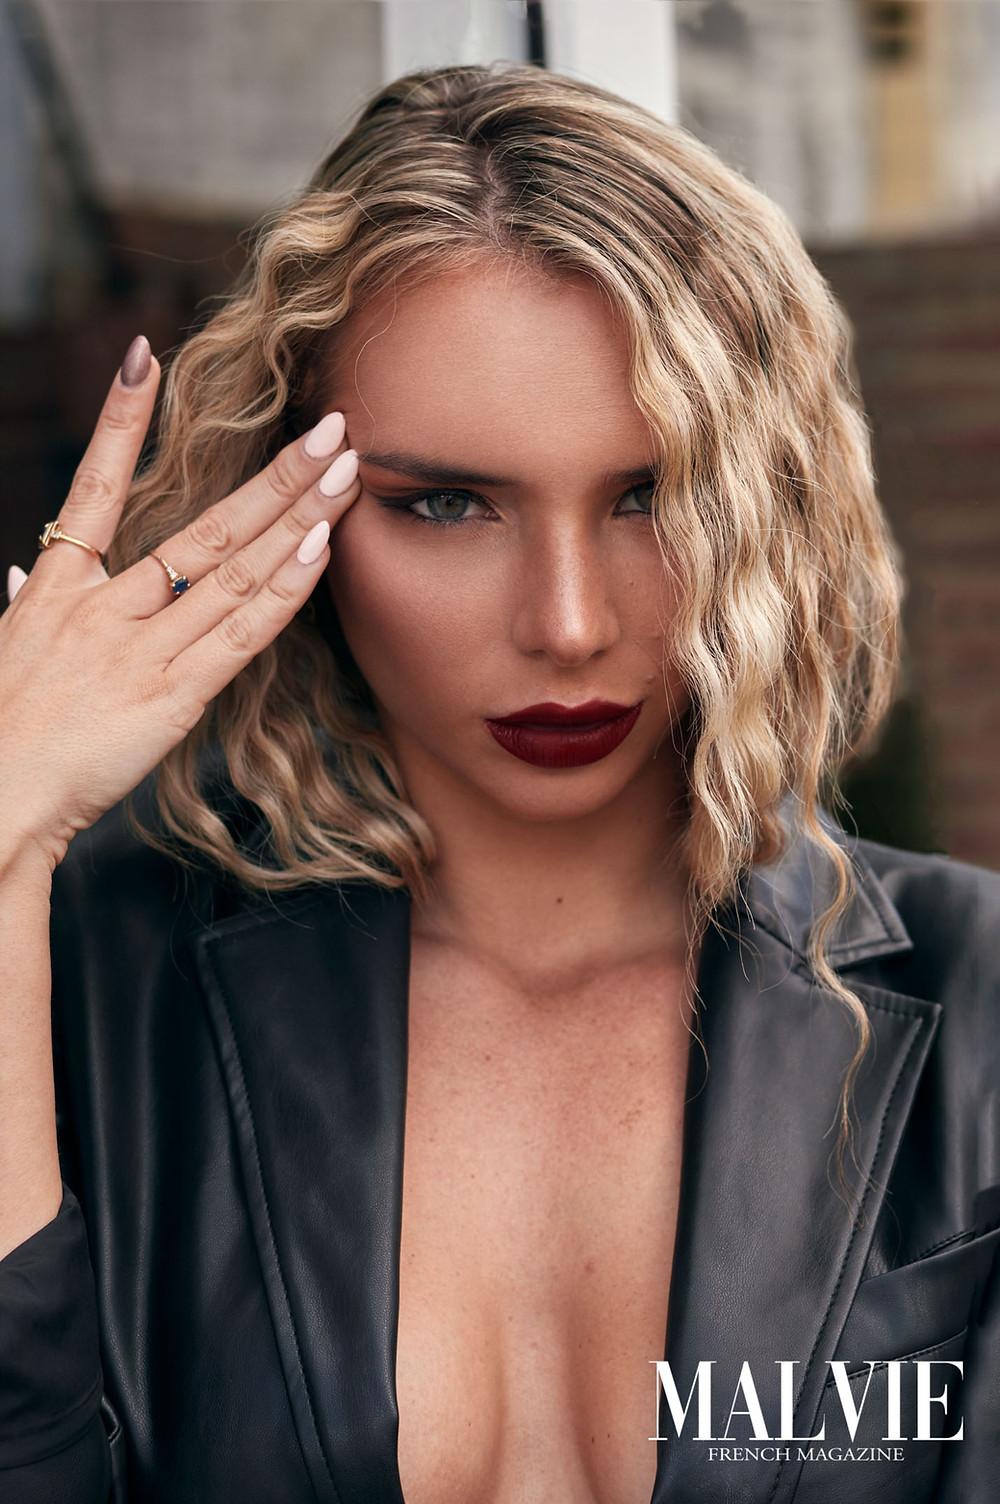 Photographer: Dario Valenzuela Navarro Model: Naiara Yunes Makeup Artist: Mauro Paulo Navarro